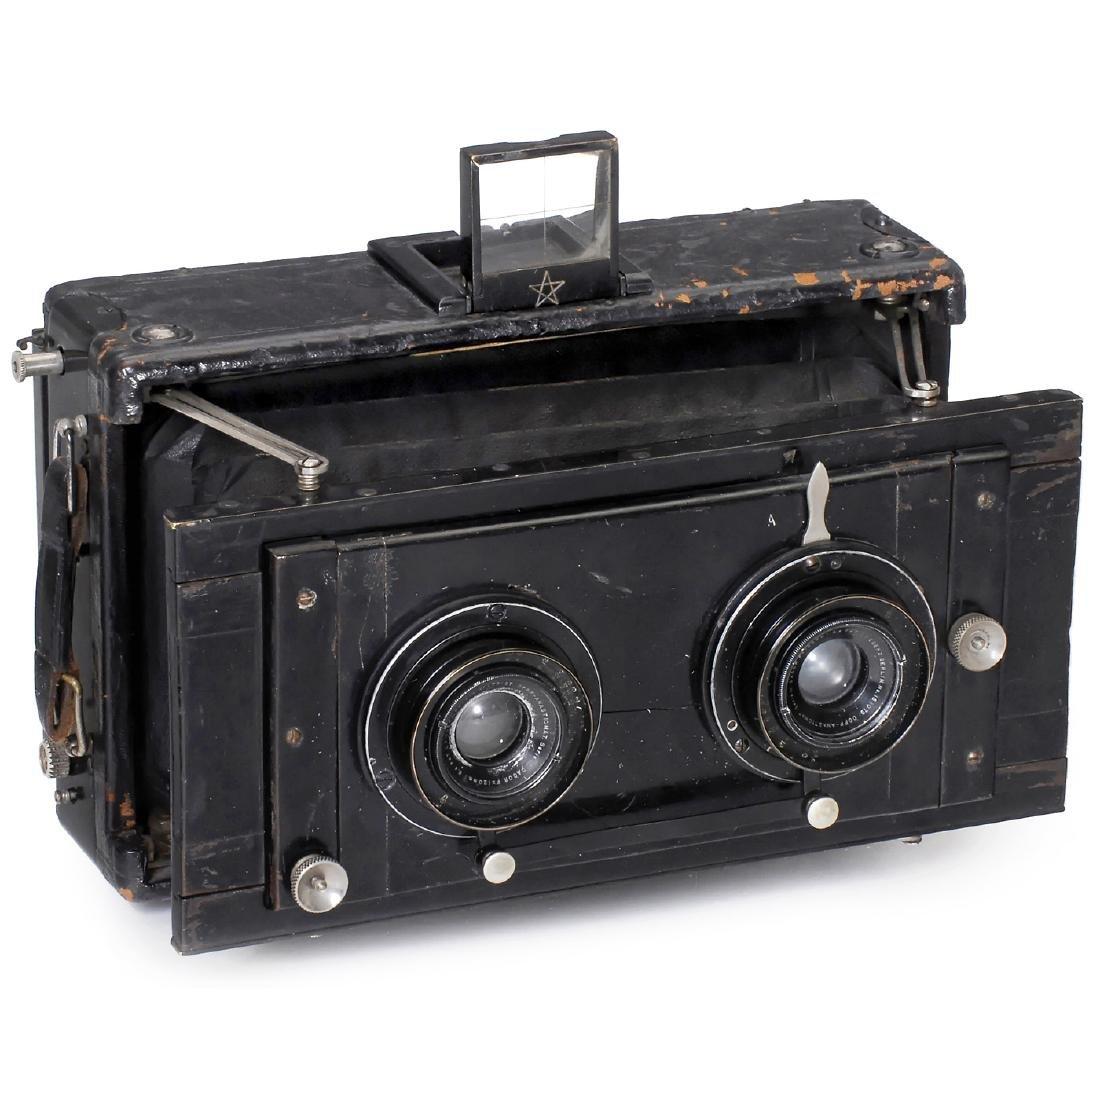 Hüttig Stereo-Panorama Camera Helios I 9 x 18, 1907